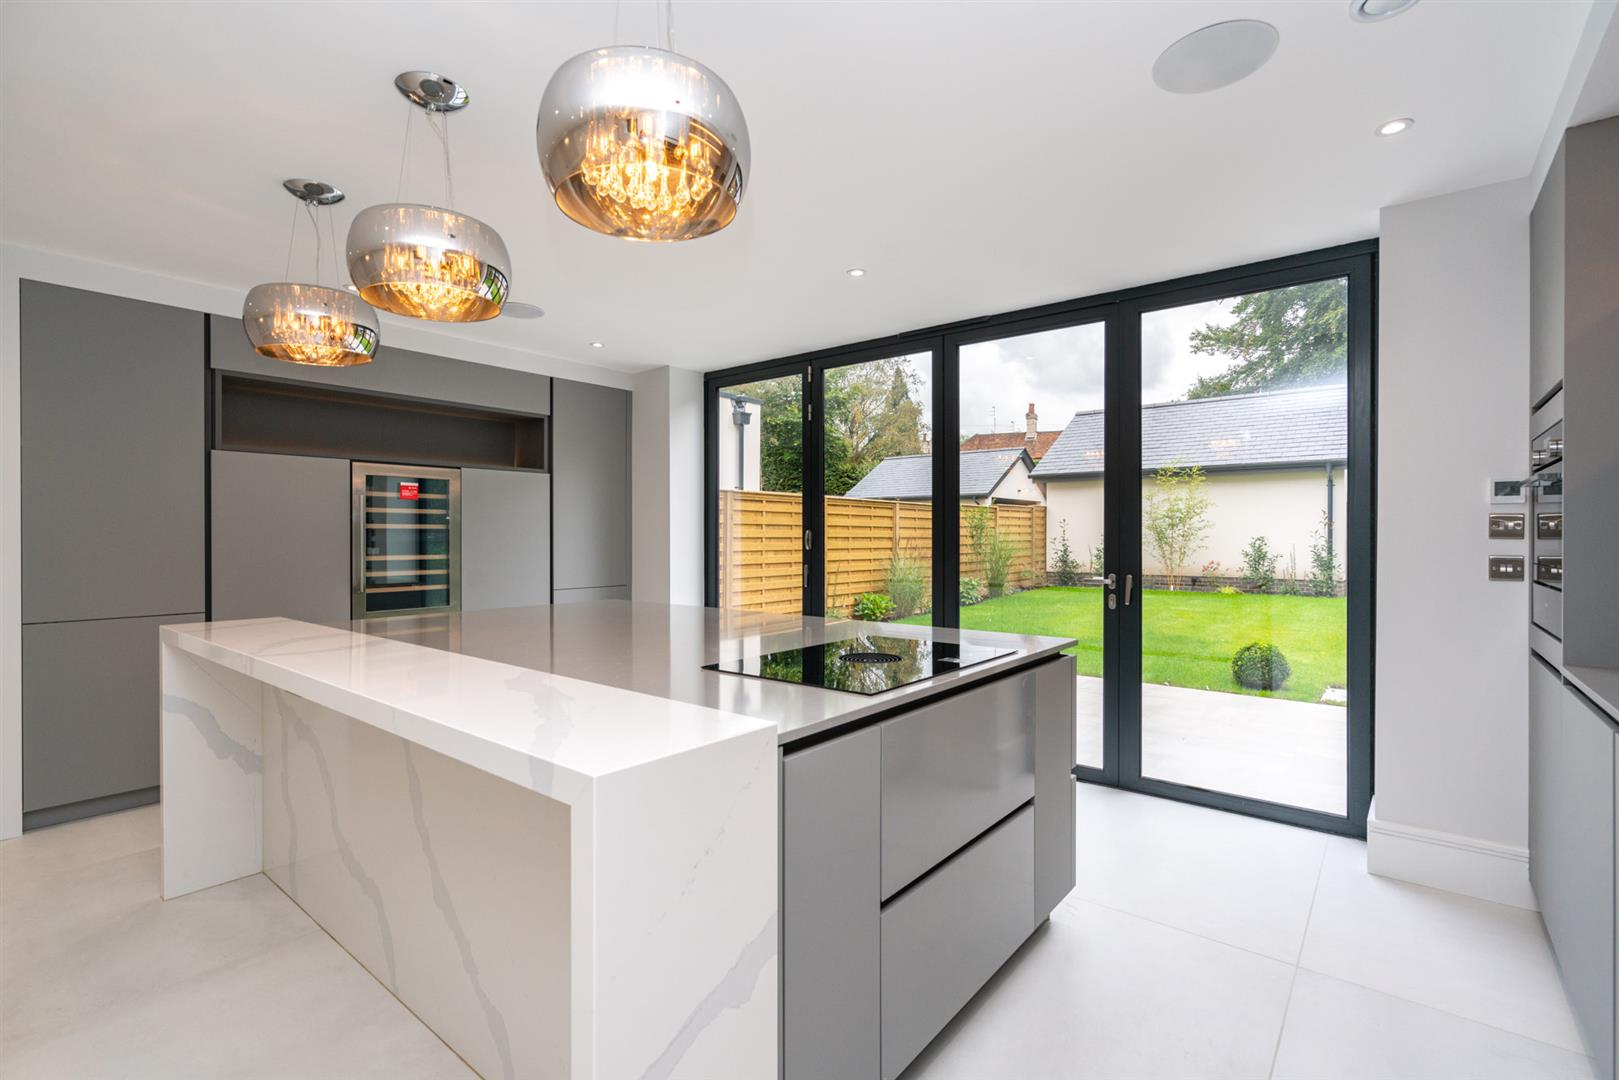 Bramley-3275 - kitchen 1.jpg